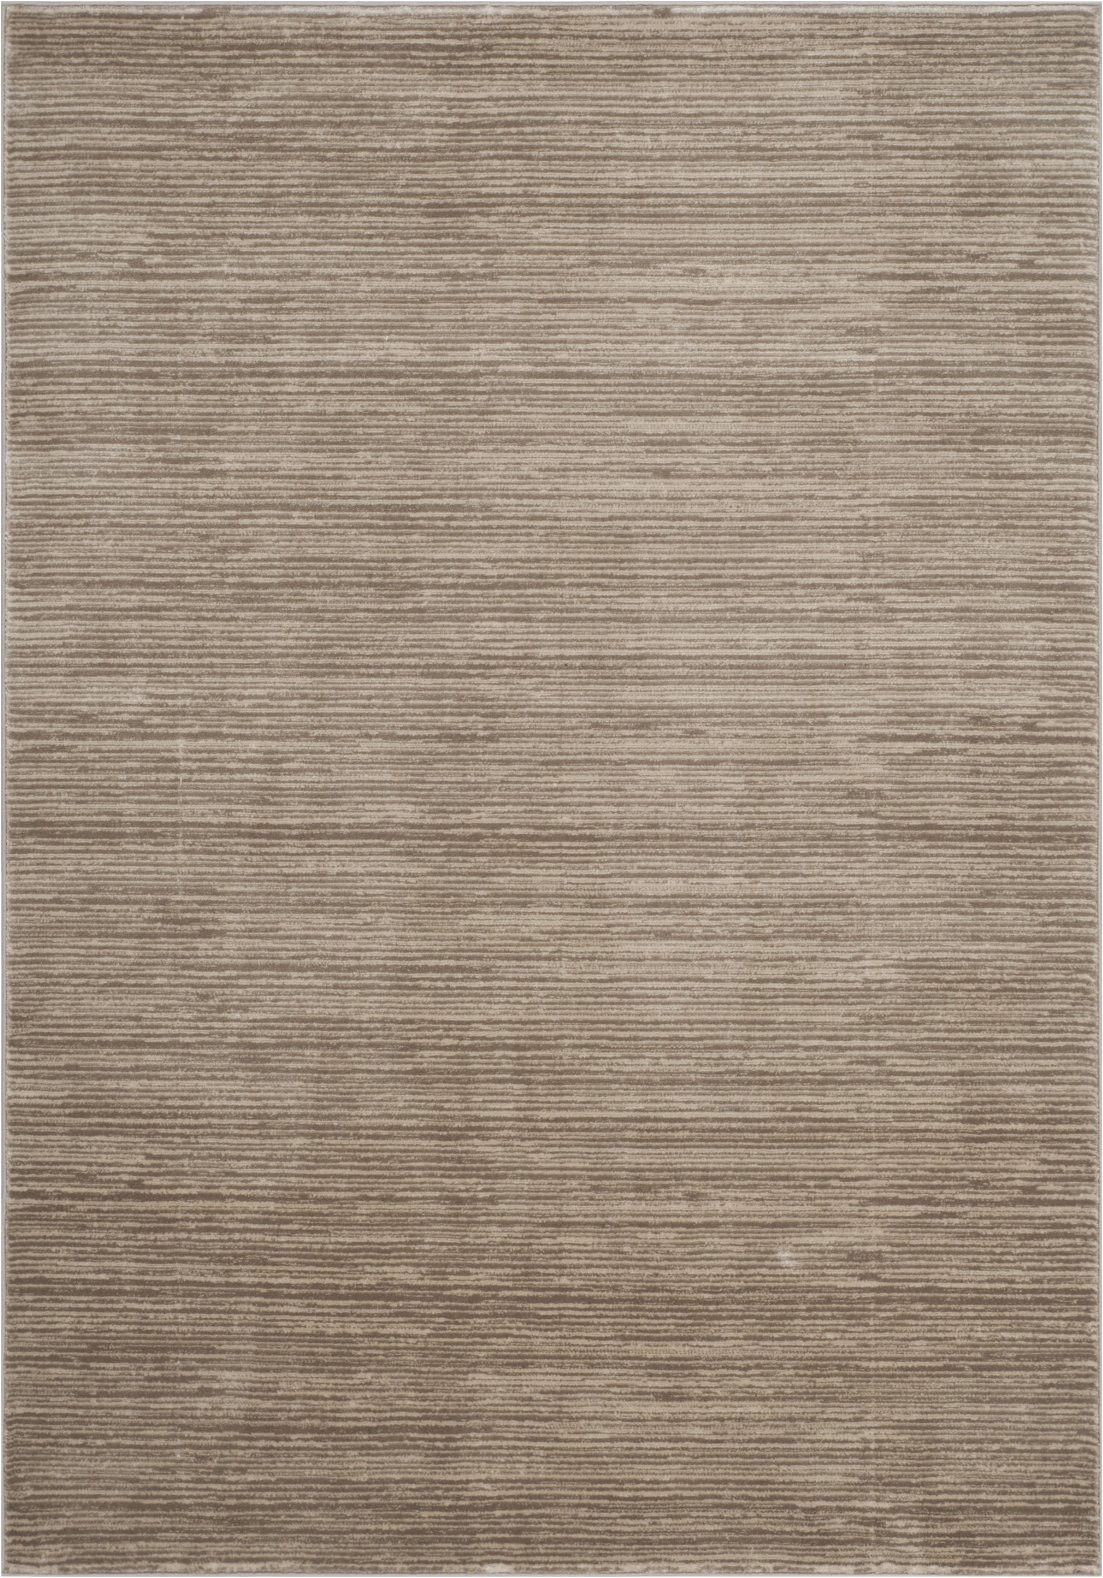 safavieh vision vsn606c light brown area rug